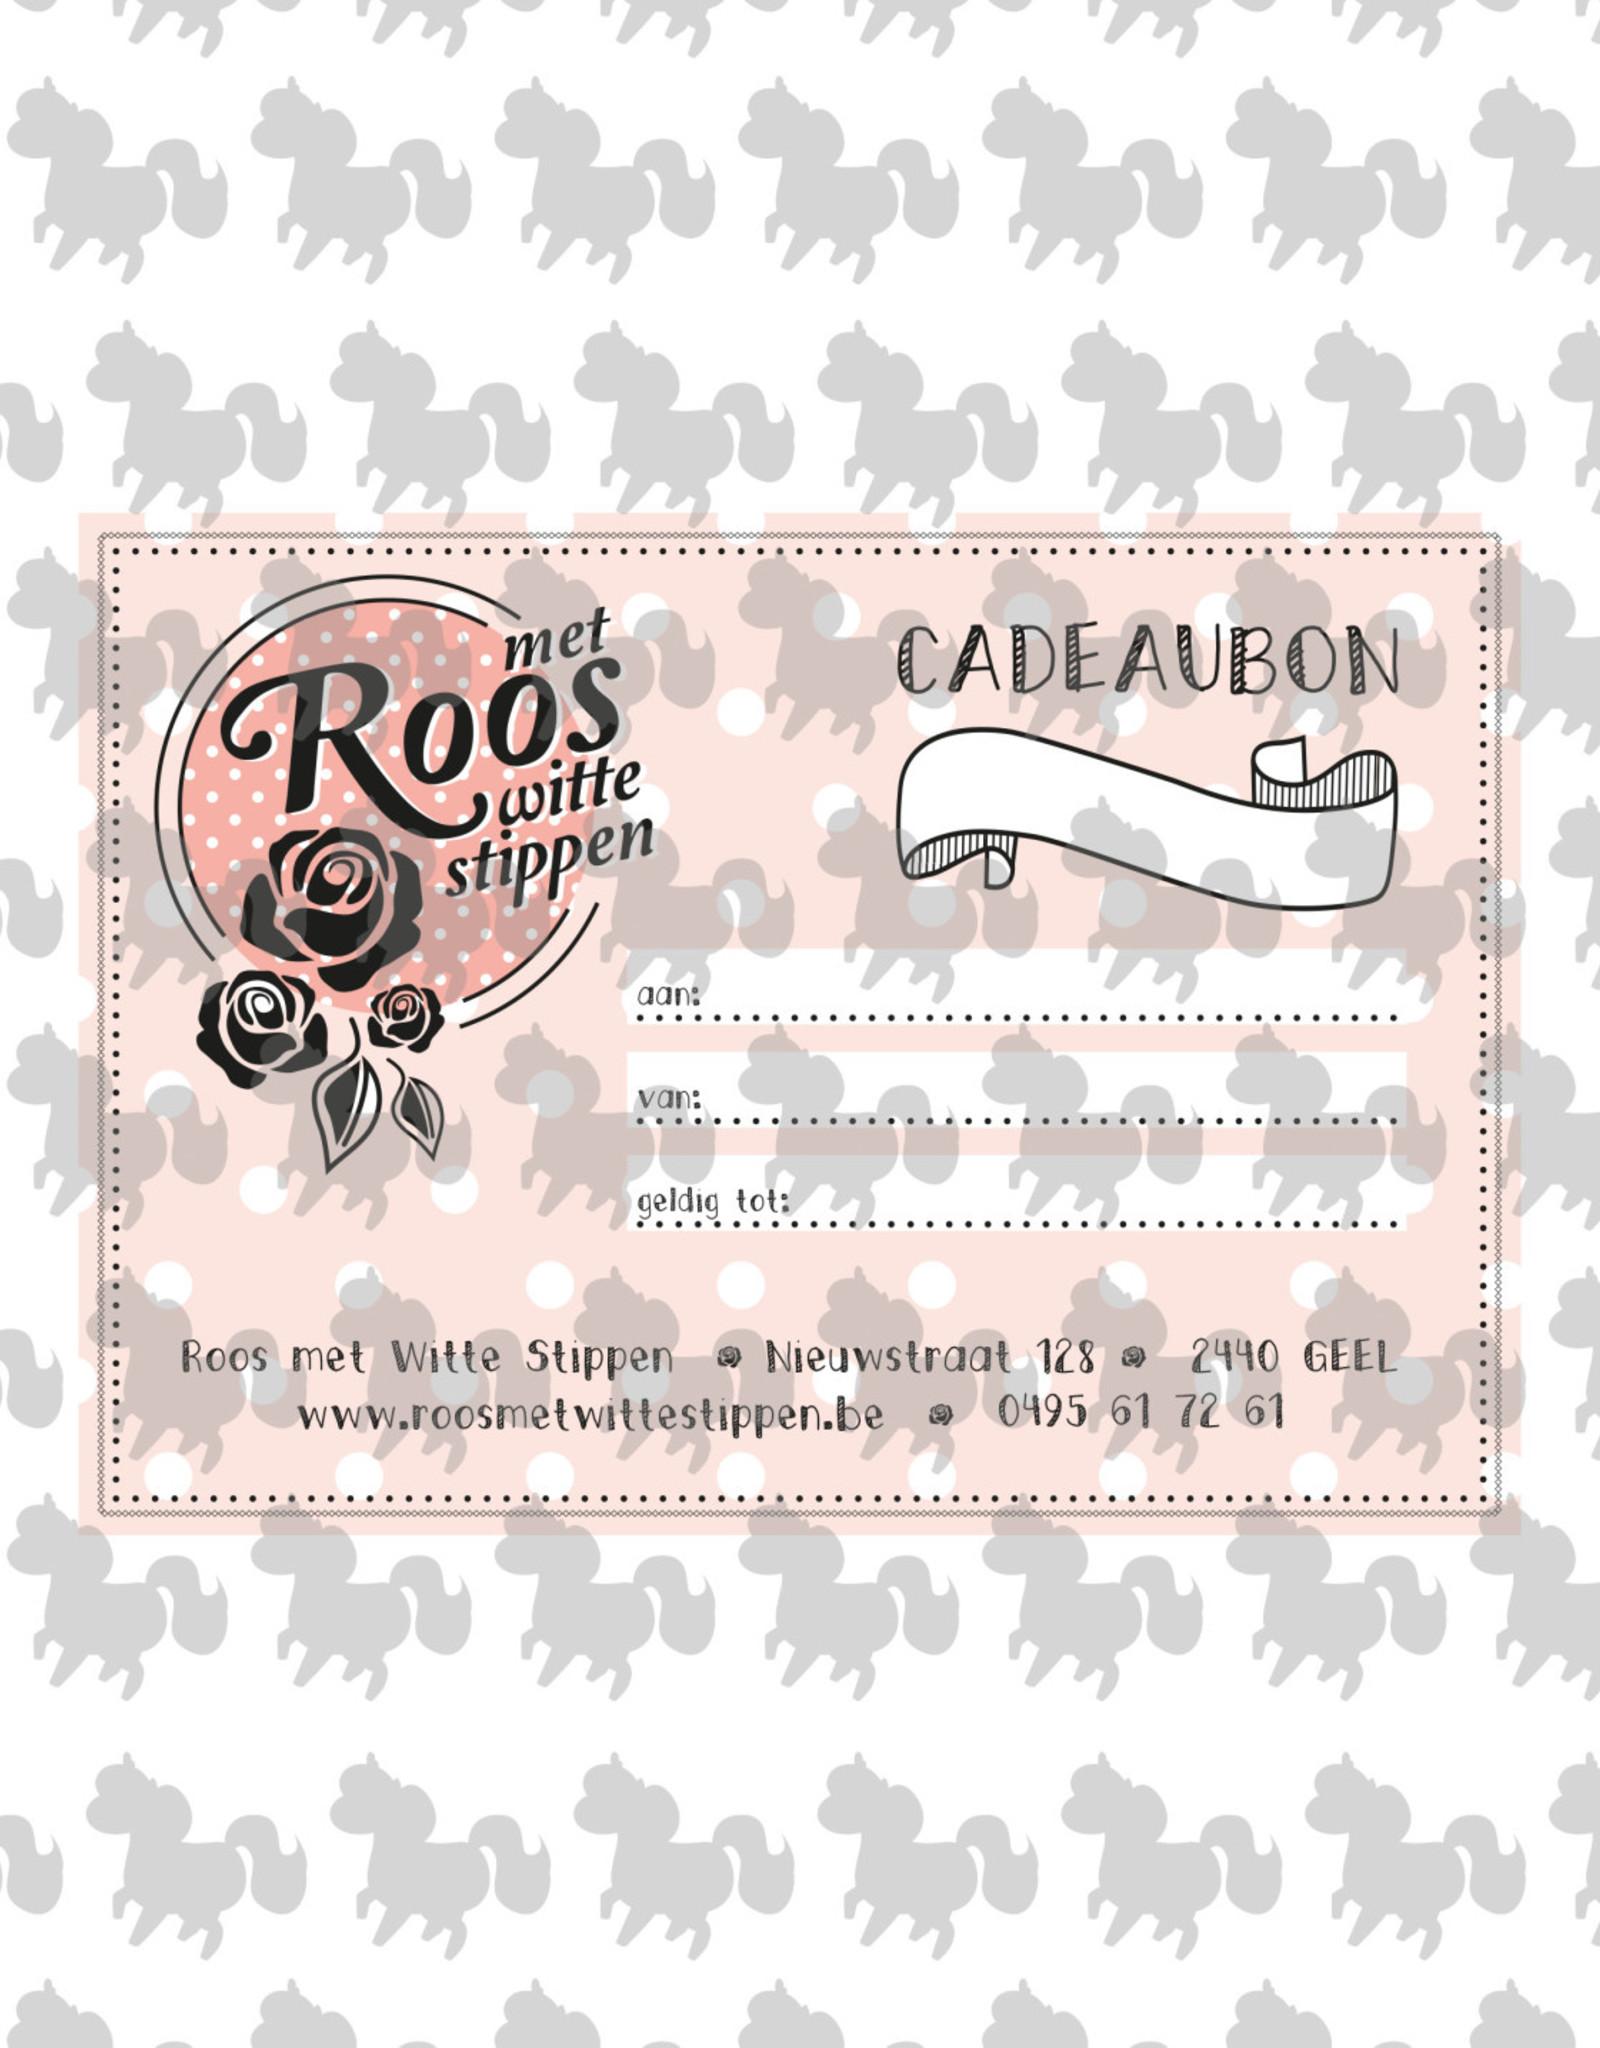 Roos met Witte Stippen Cadeaubon 15 euro